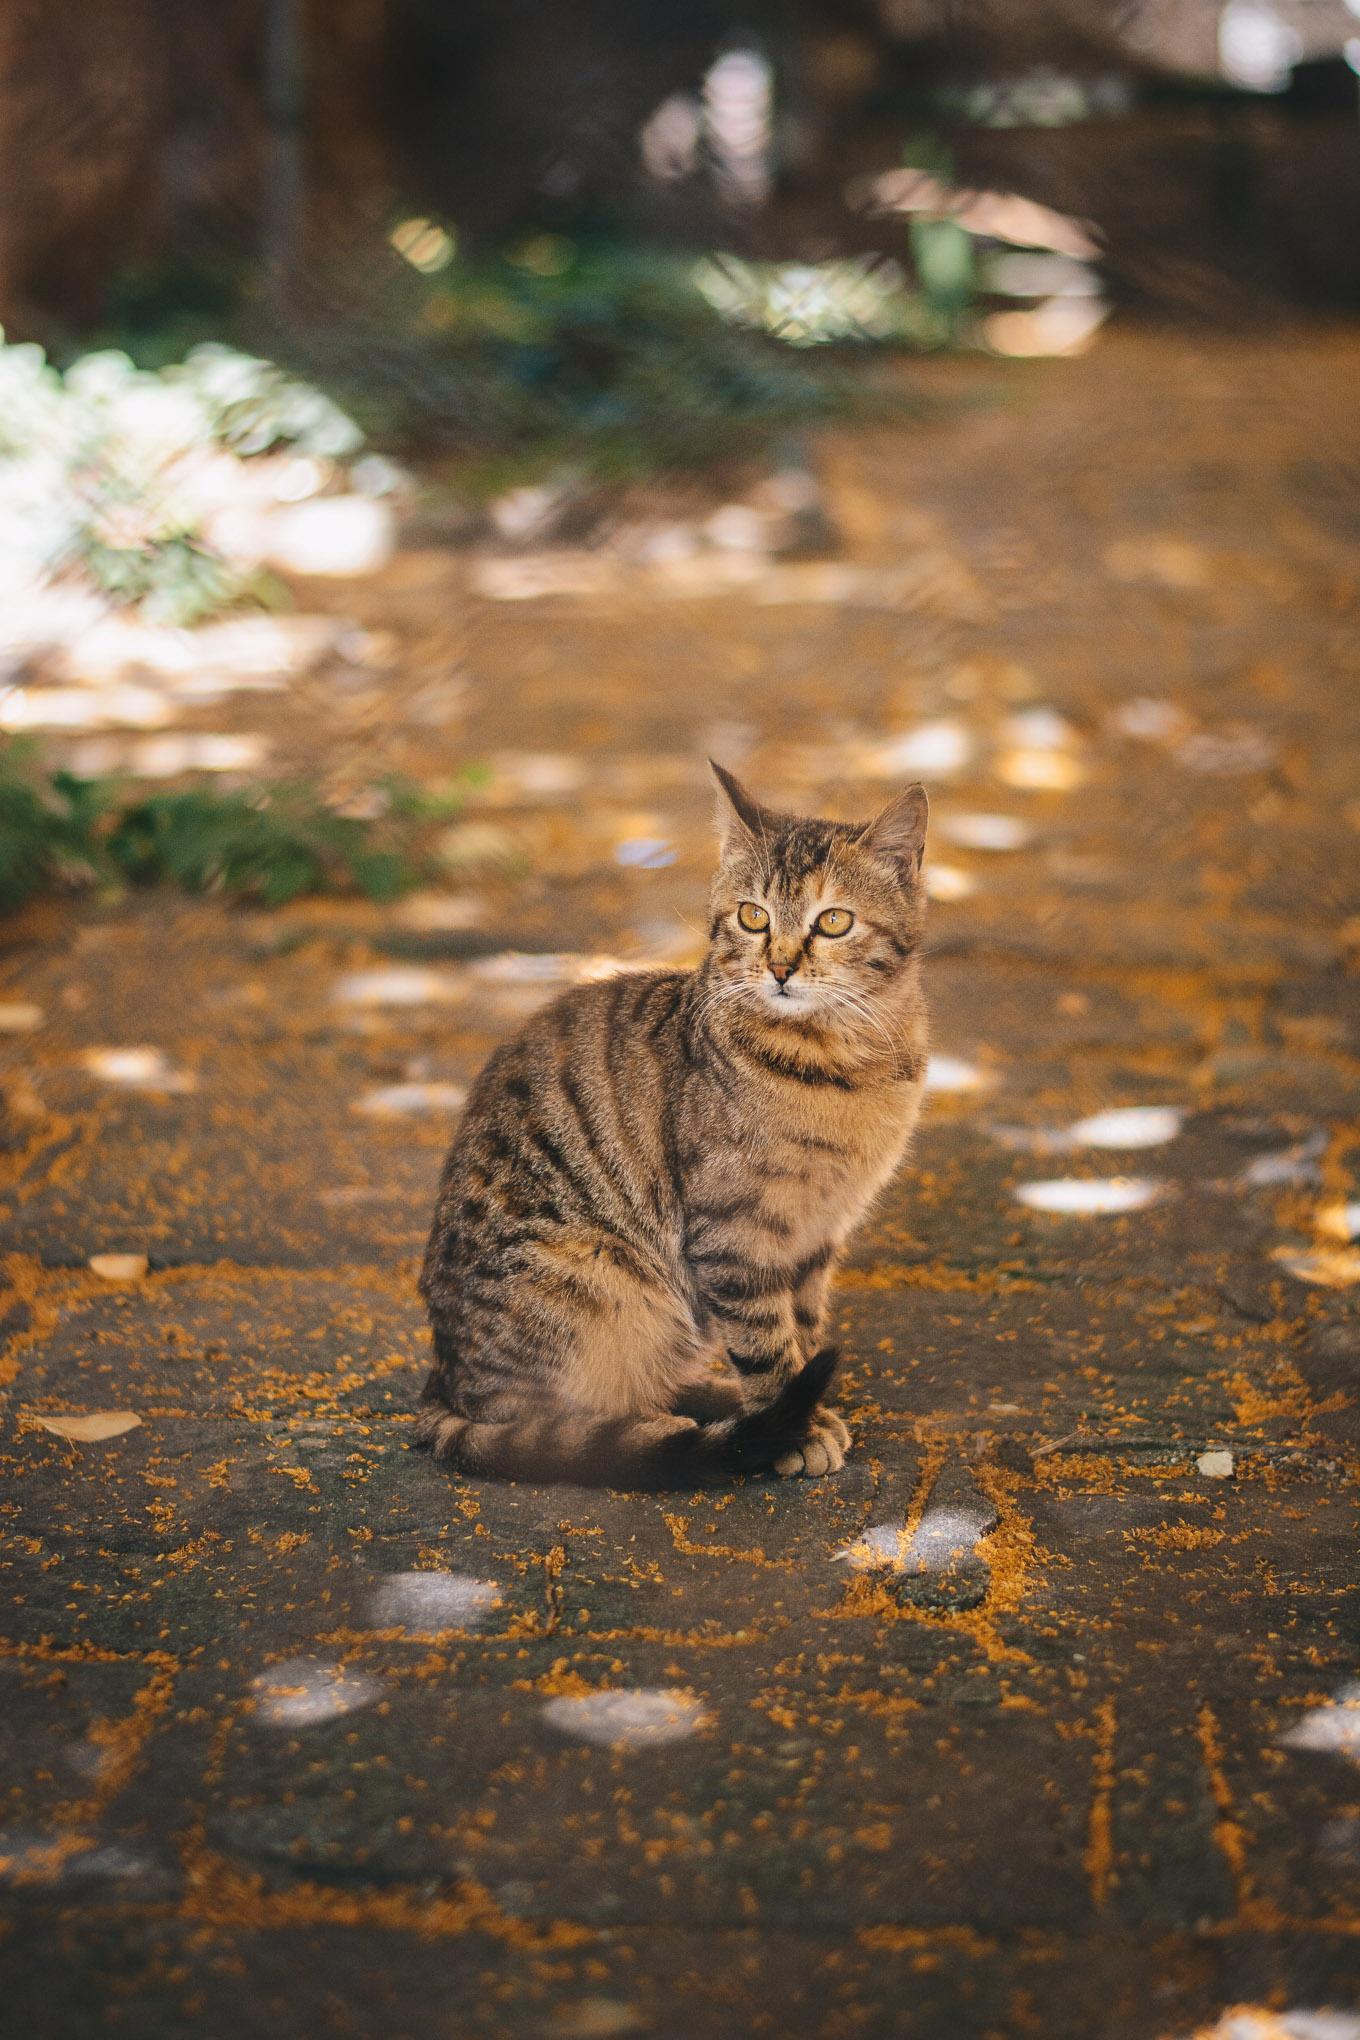 Cat in sofia